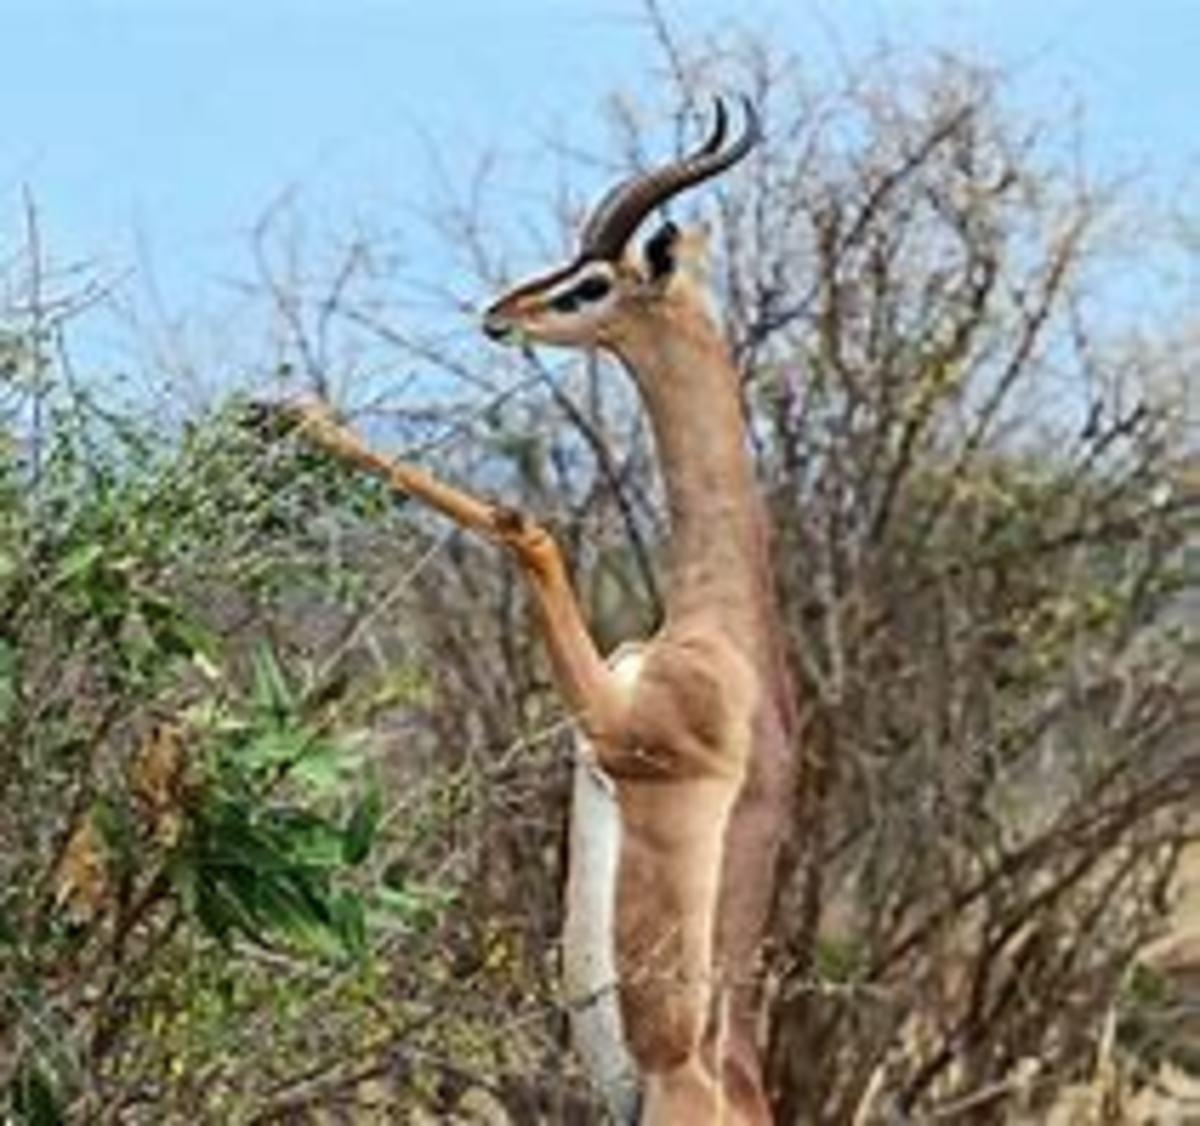 A Gerenuk looking for food